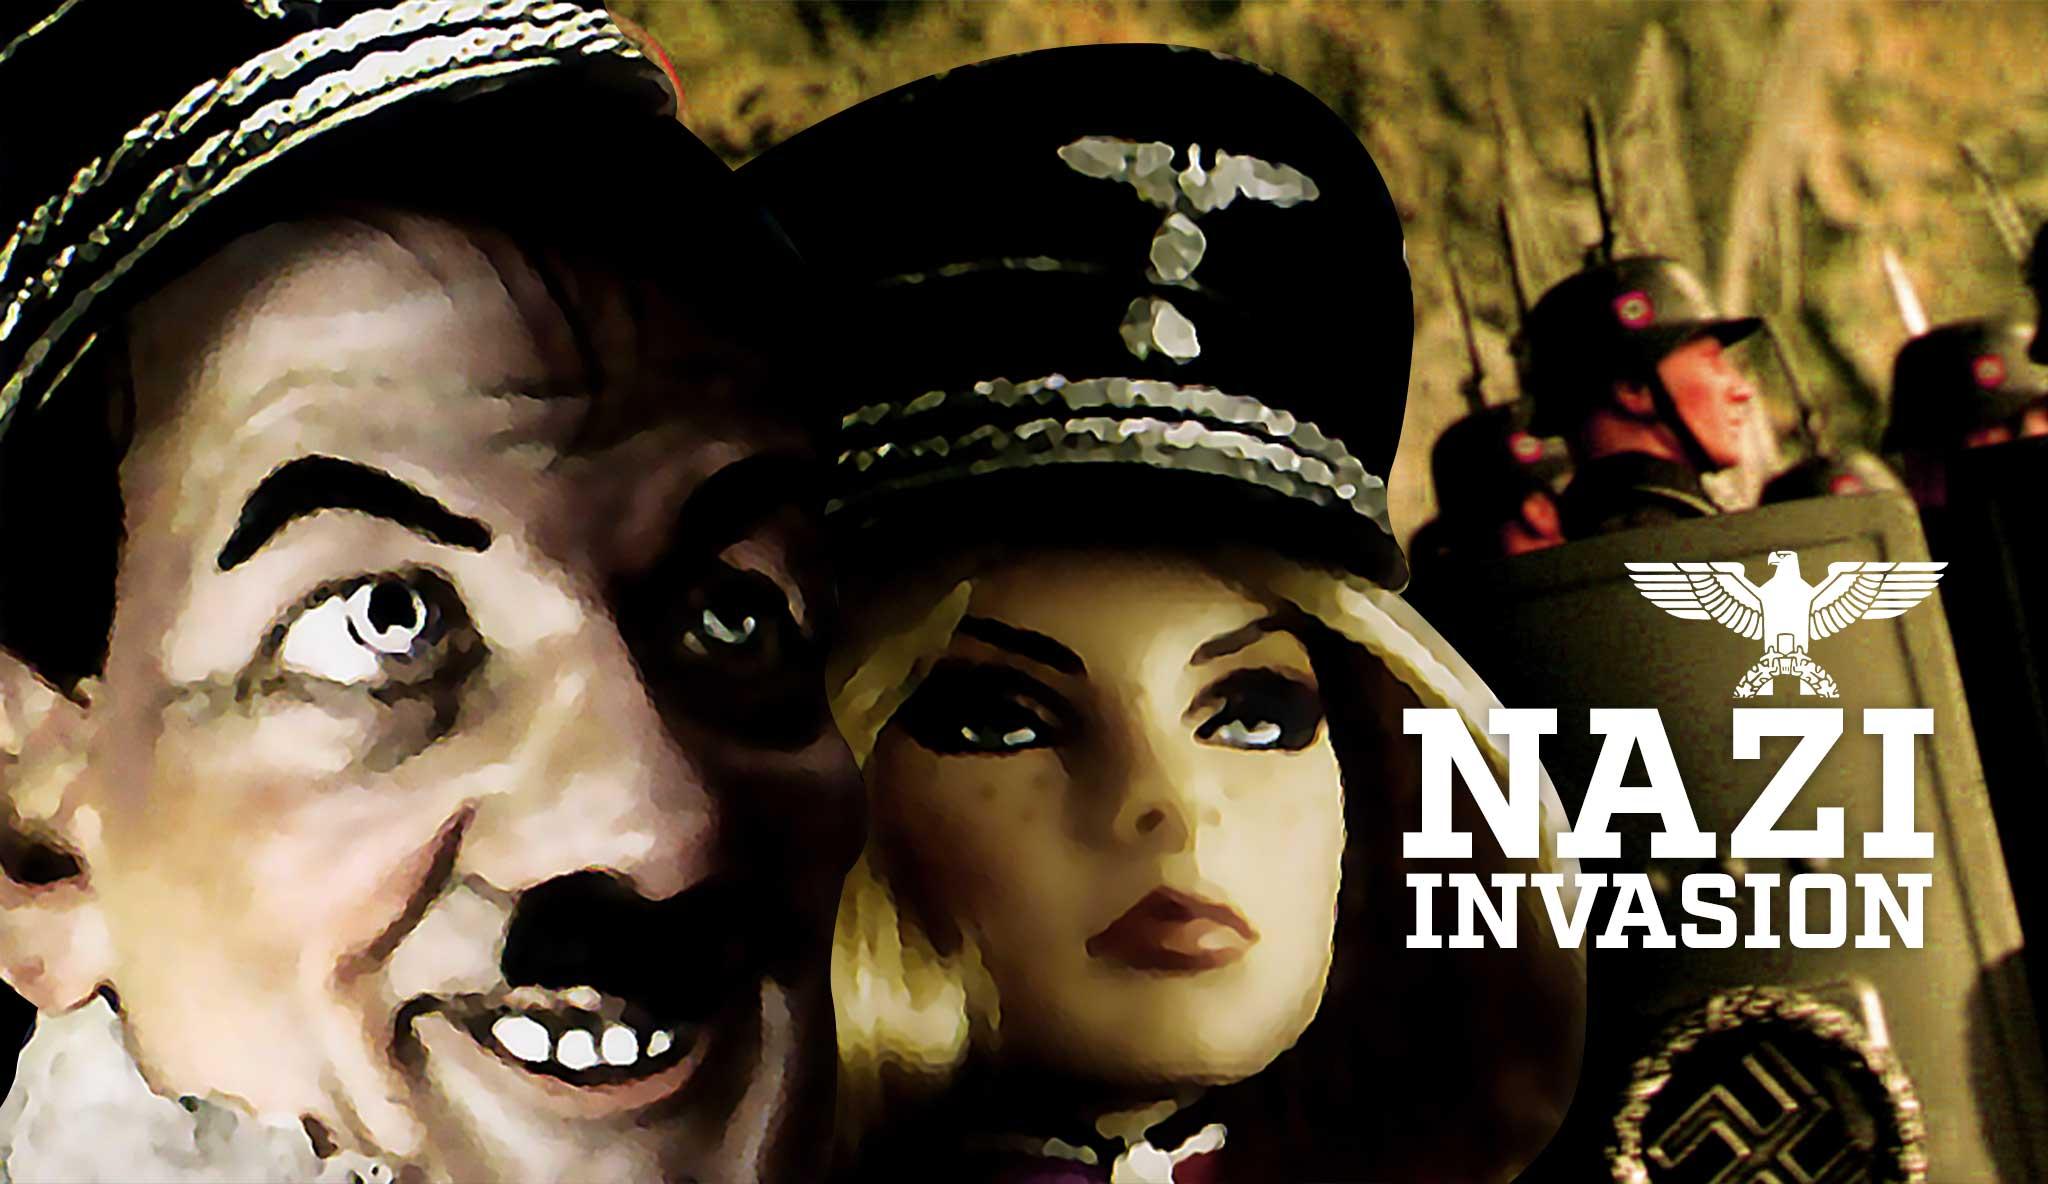 nazi-invasion\header.jpg